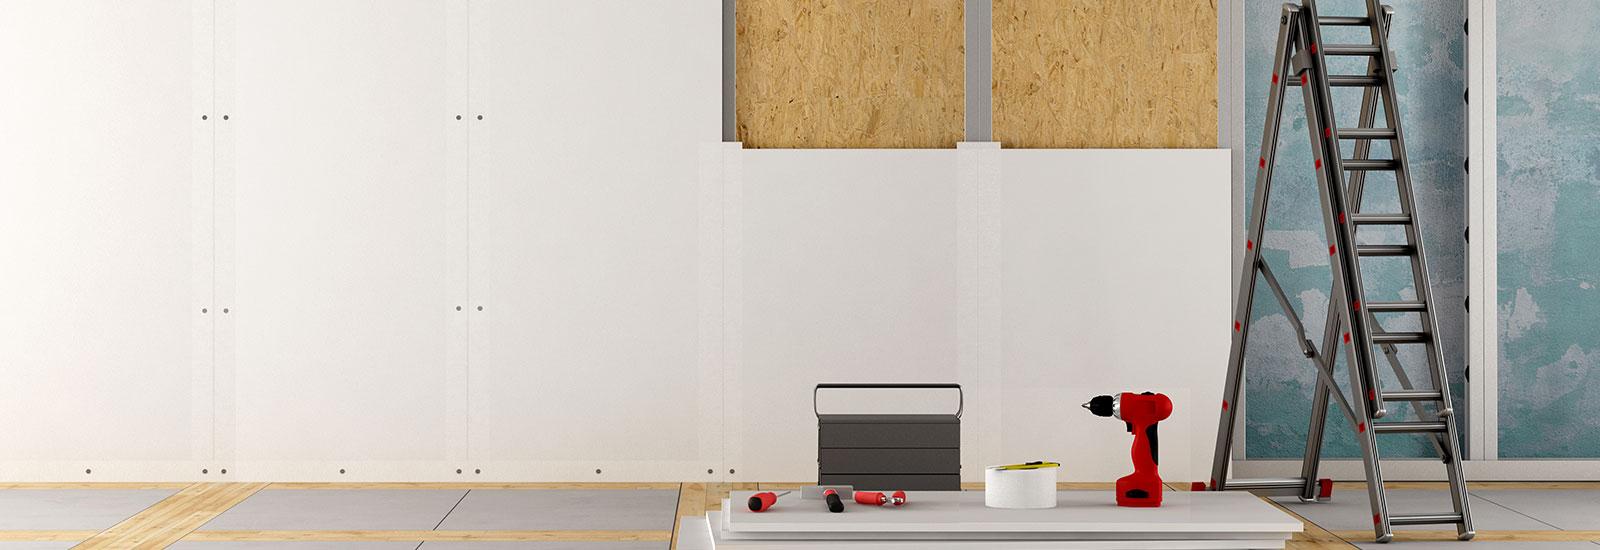 platrerie la fl che travaux isolation le lude. Black Bedroom Furniture Sets. Home Design Ideas